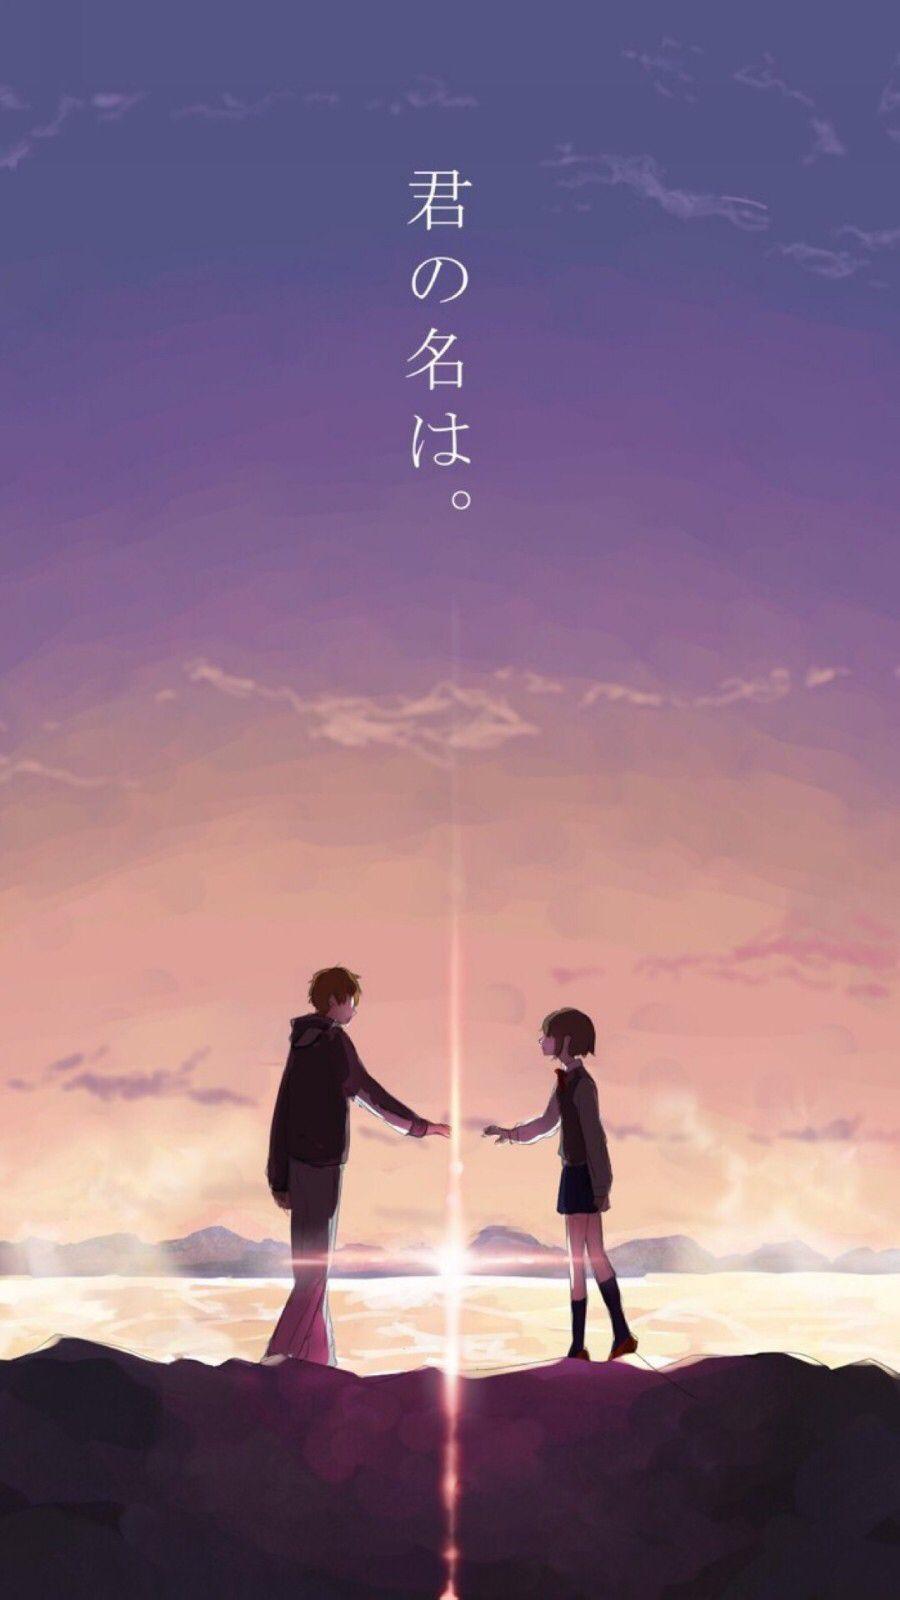 Anime Couple Love Romance Hd Wallpaper Anime Romantic Couples Cute Couple Wallpaper Love Cartoon Couple Anime Love Couple